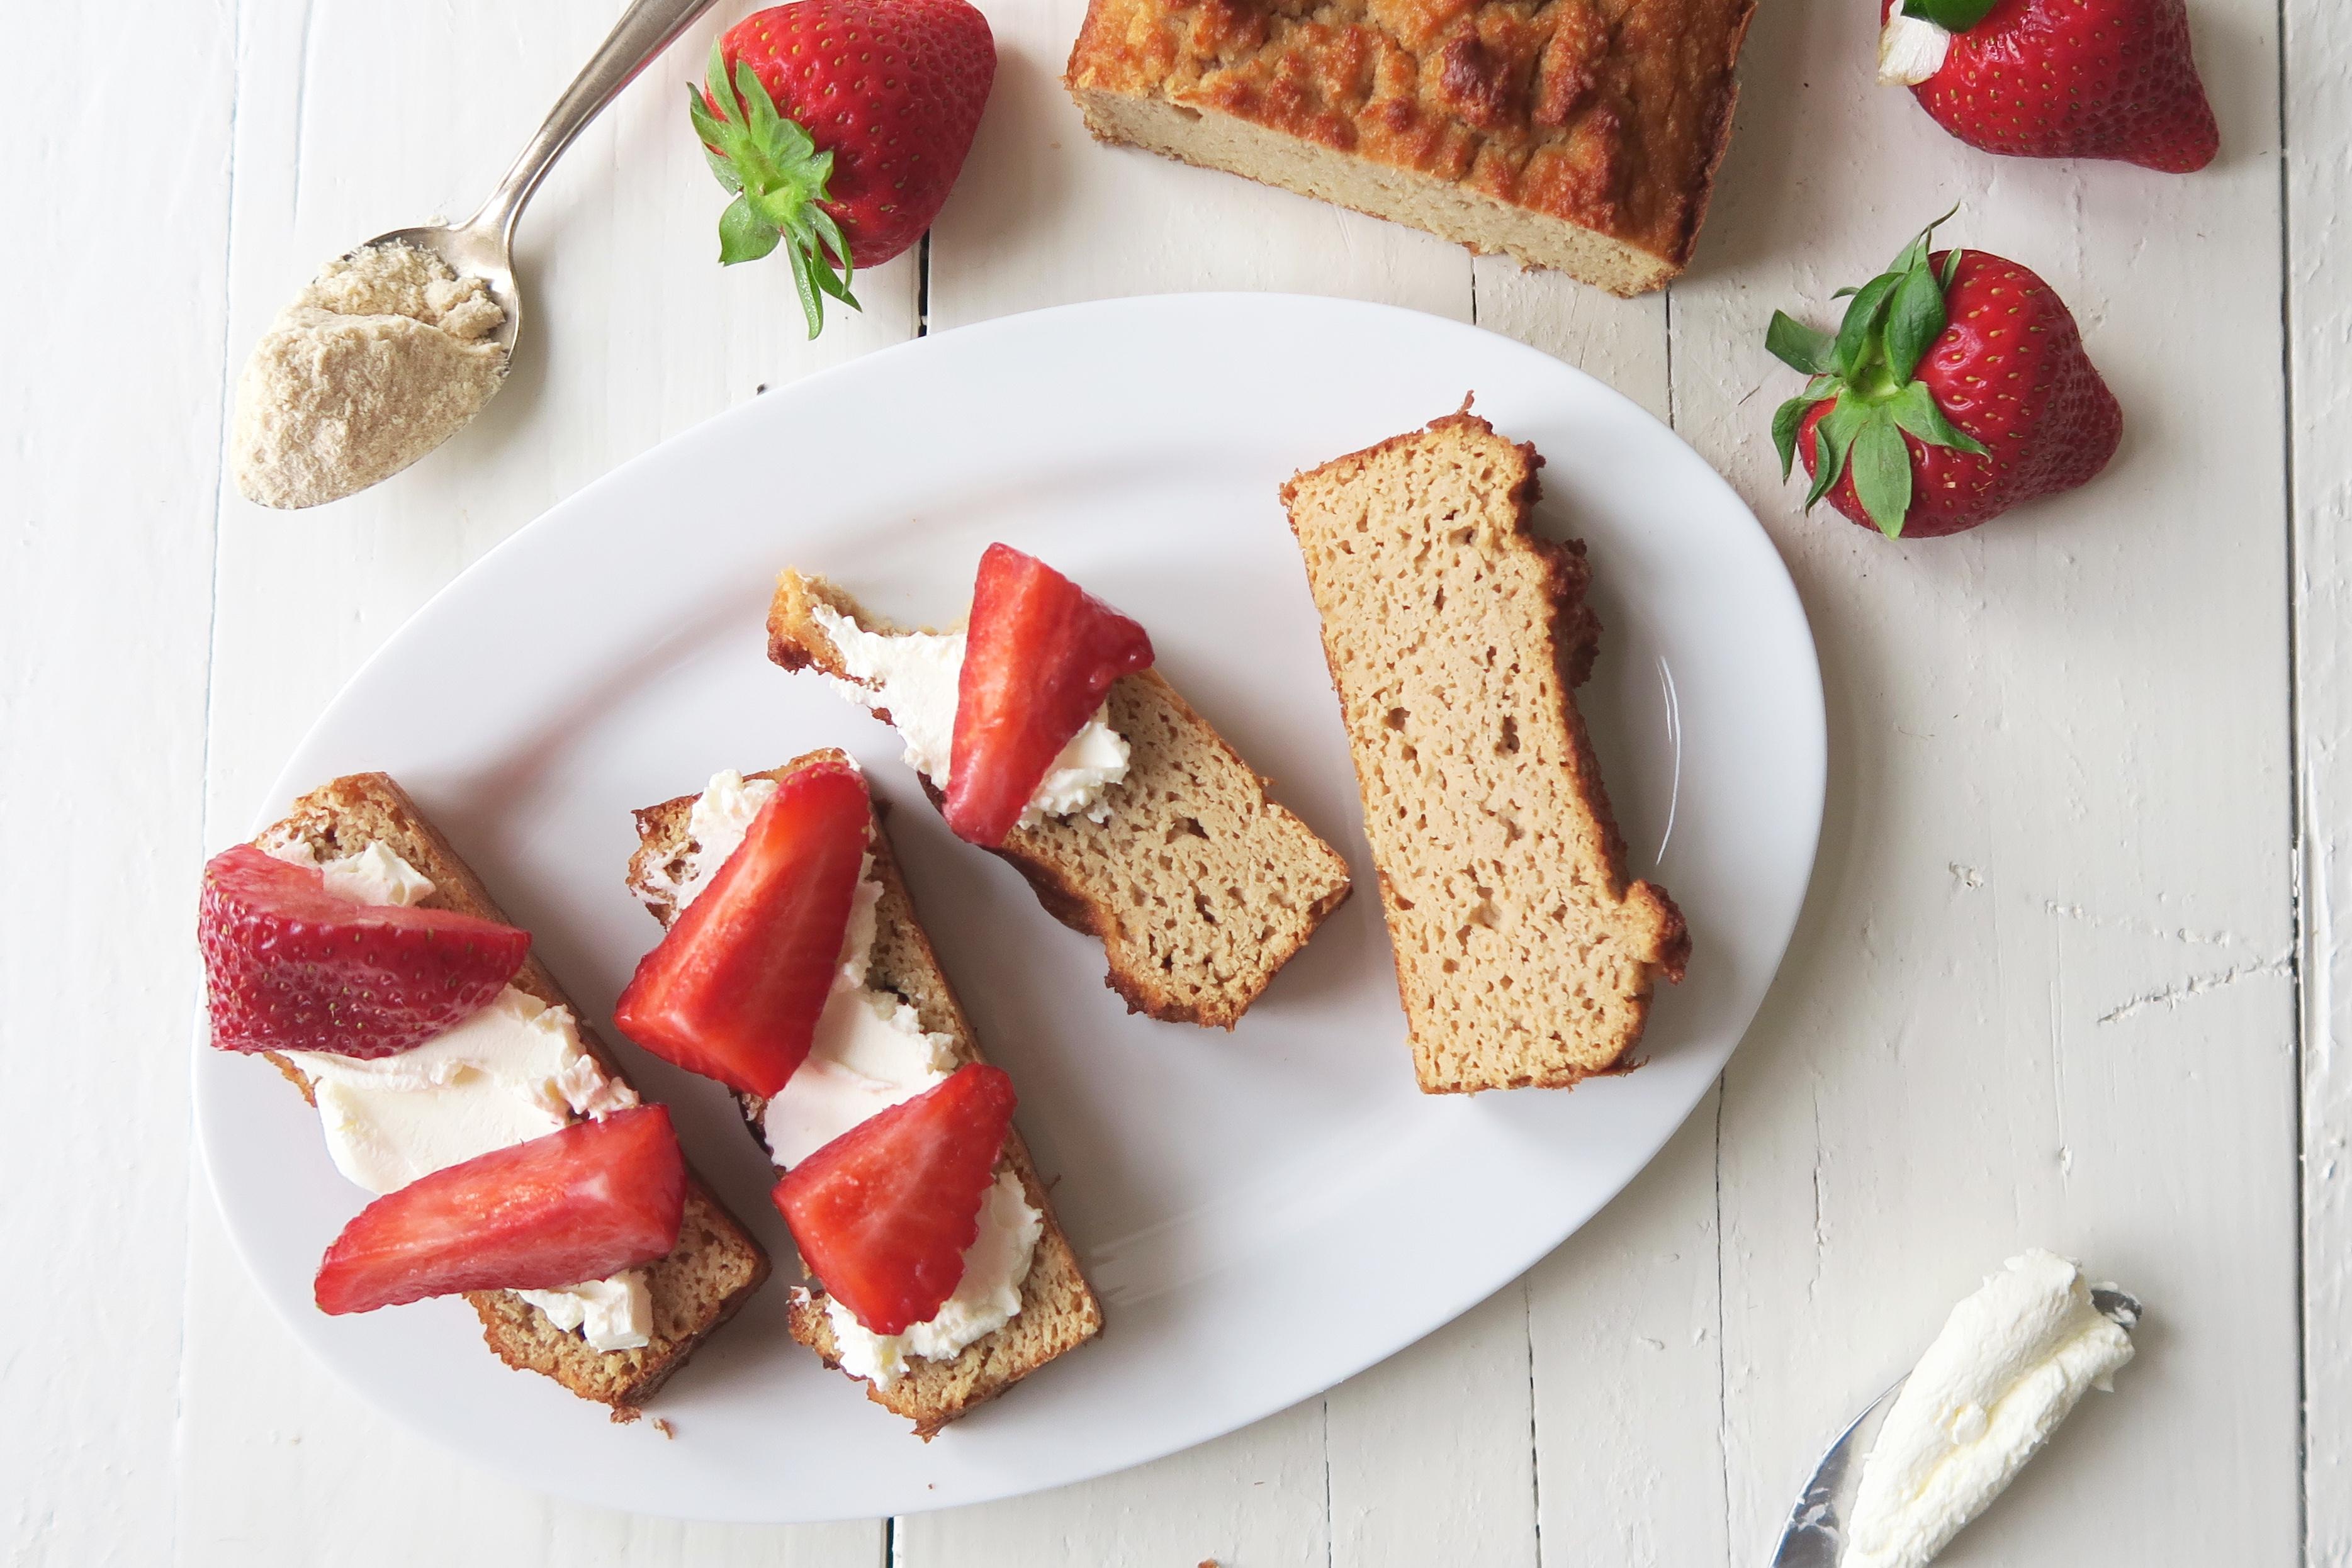 Kokoscake met aardbeien en mascarpone van Beaufood